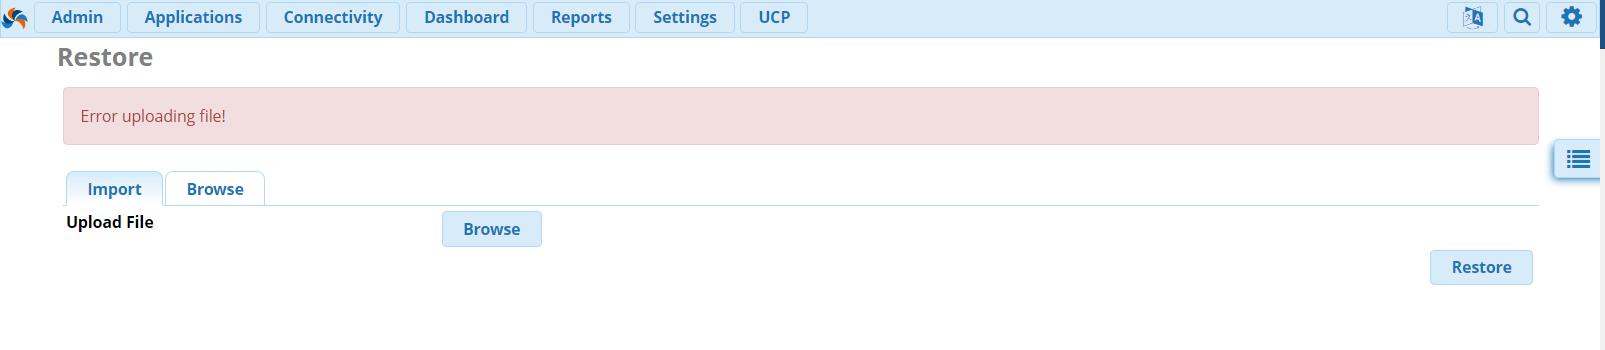 FreePBX 13: Как решить ошибку при загрузке Backup файла